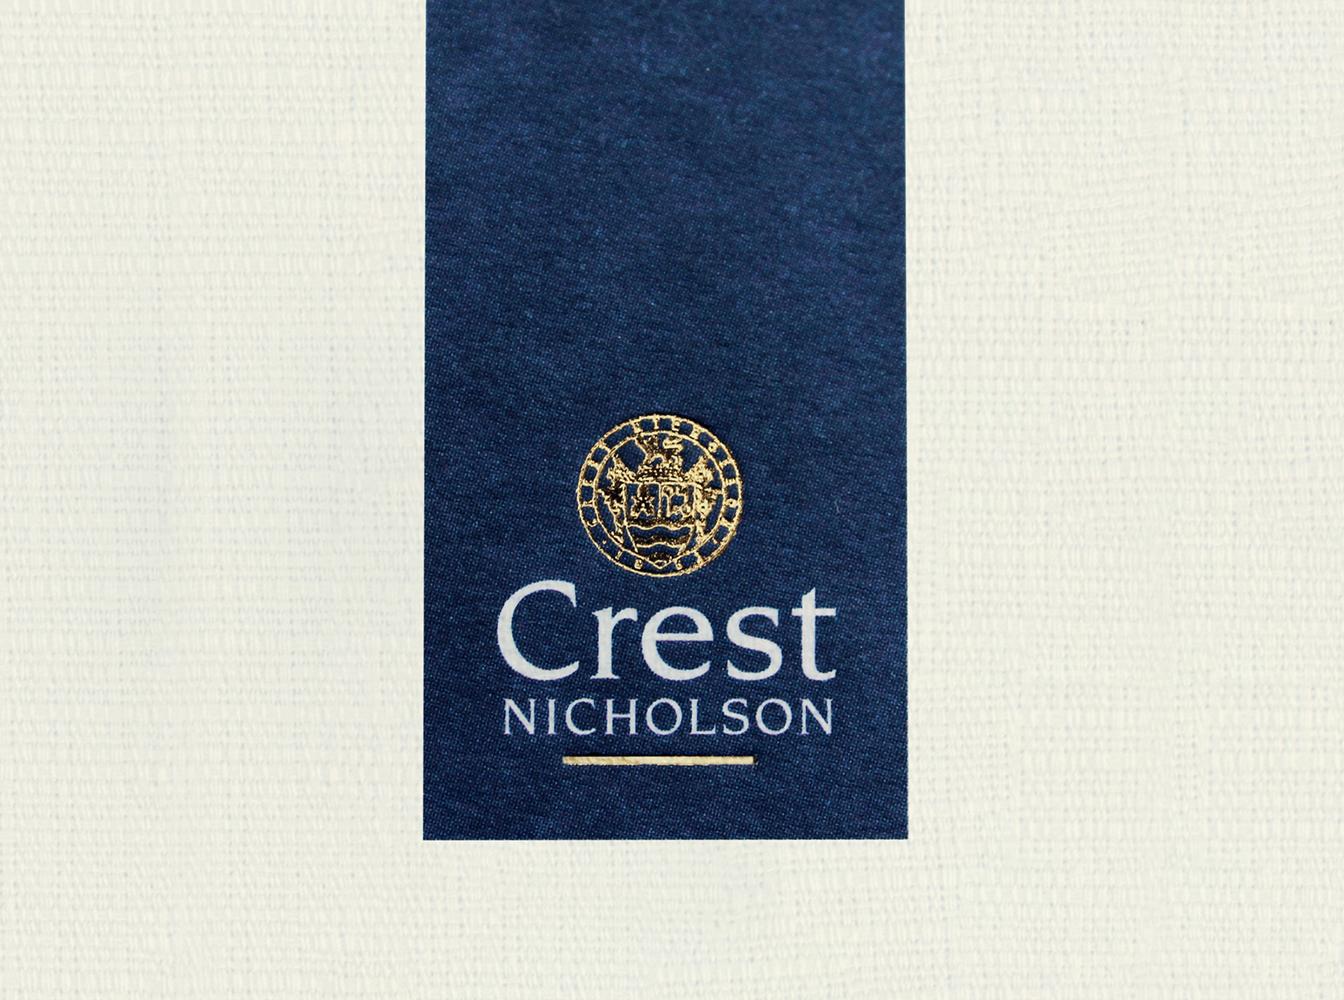 Crest Nicholson Alconbury Weald project